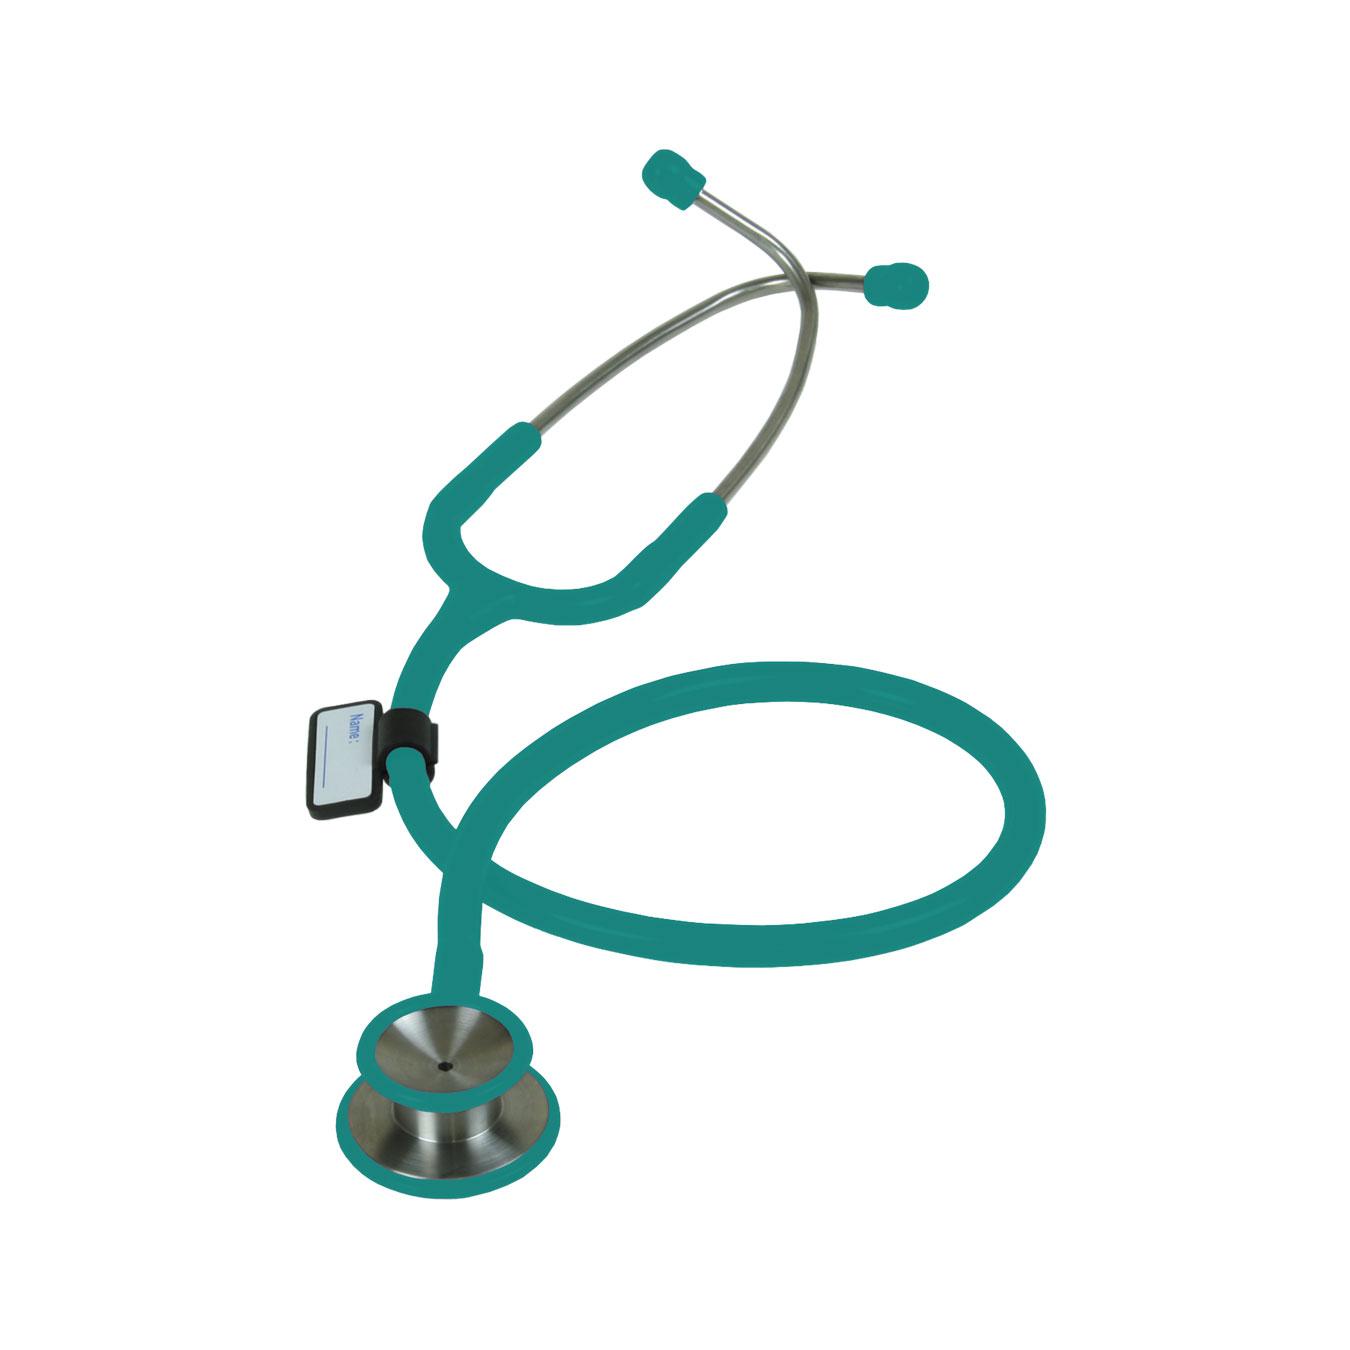 LSCLT_1_Liberty-Classic-Stethoscope-Teal